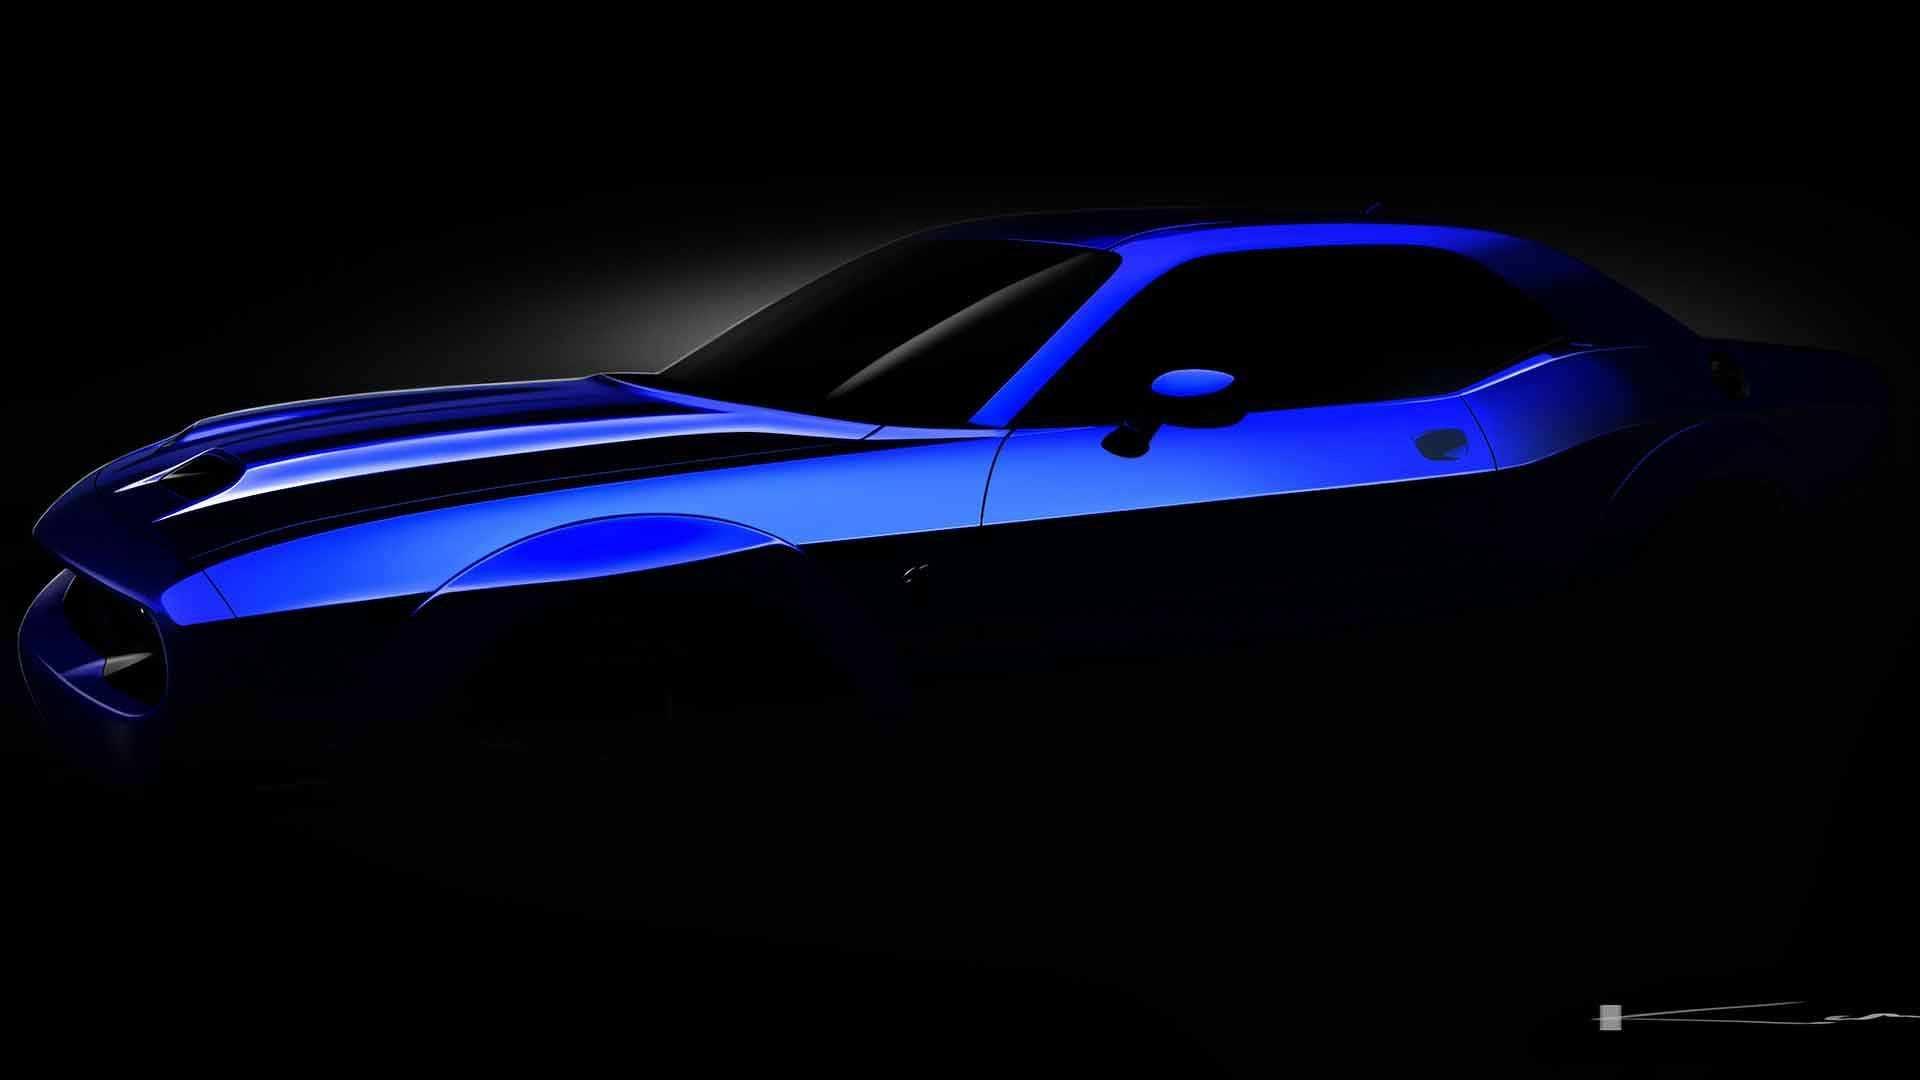 47 Gallery of New Dodge 2019 Challenger Hellcat Exterior Images with New Dodge 2019 Challenger Hellcat Exterior